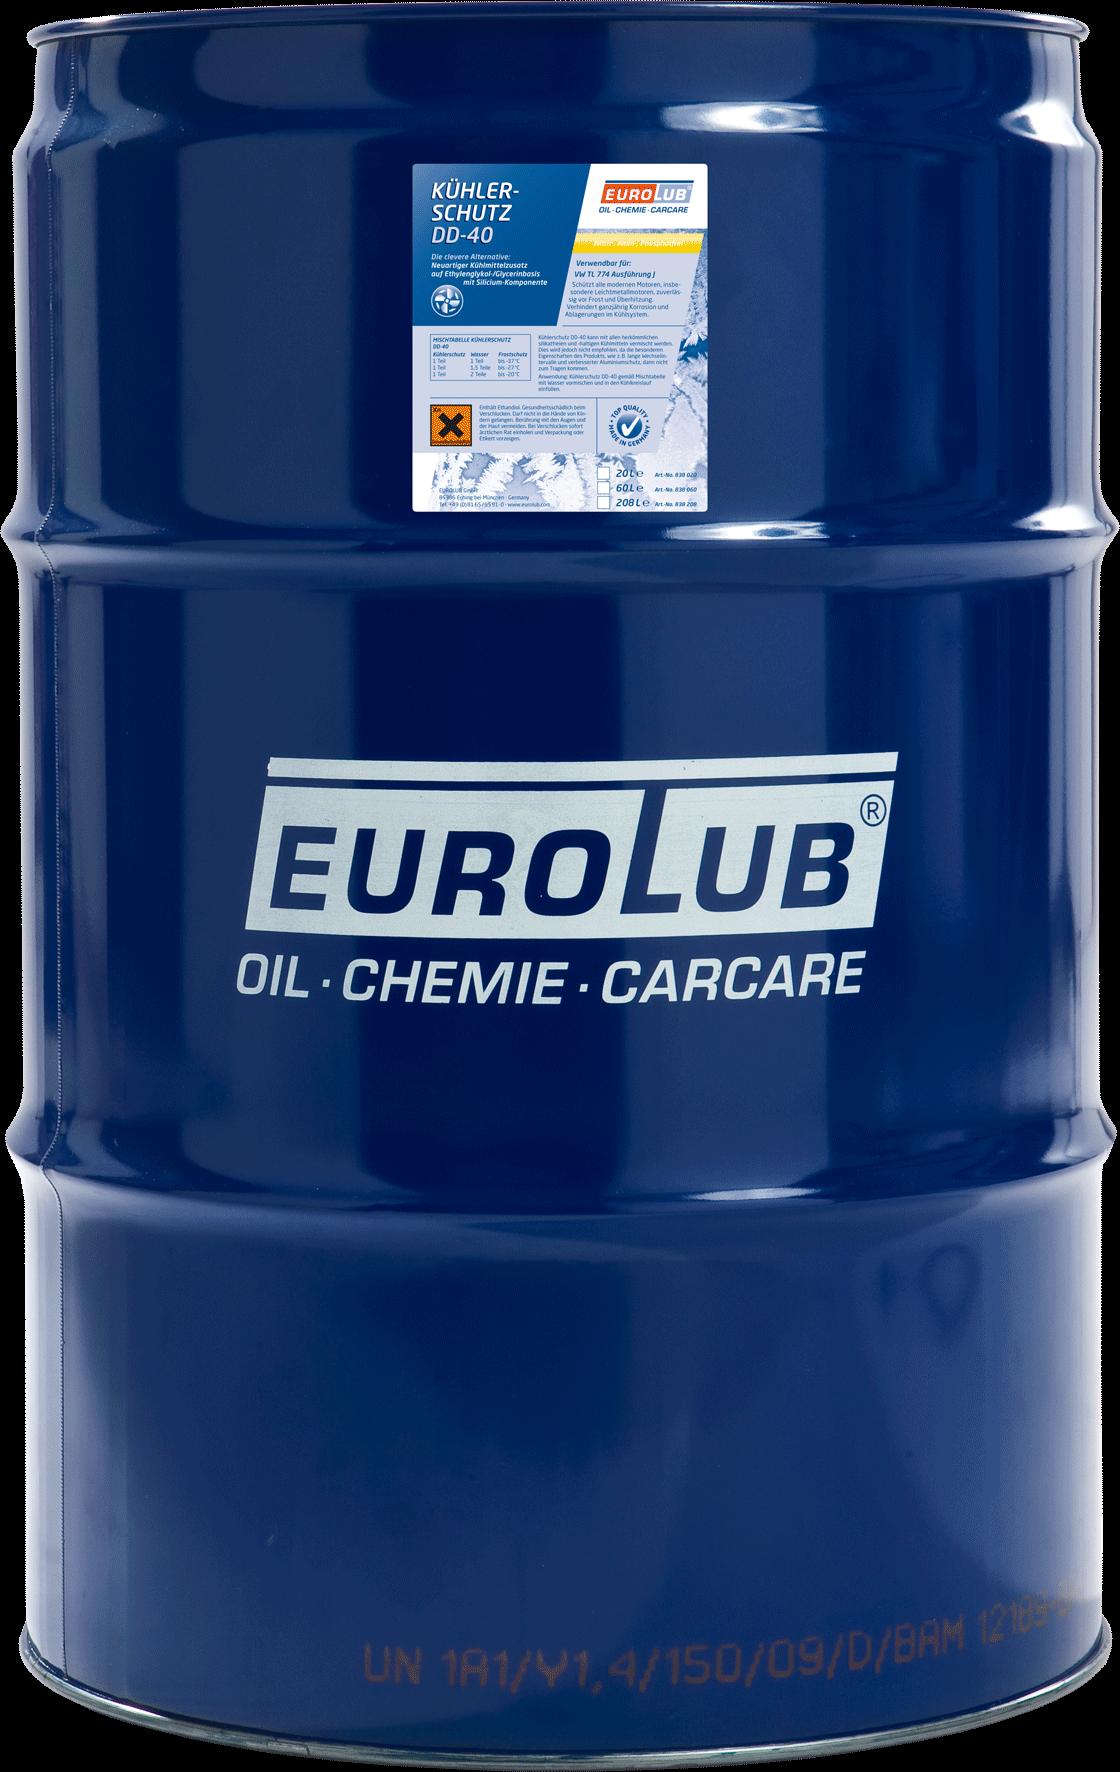 EUROLUB Kuhlerschutz  DD-40